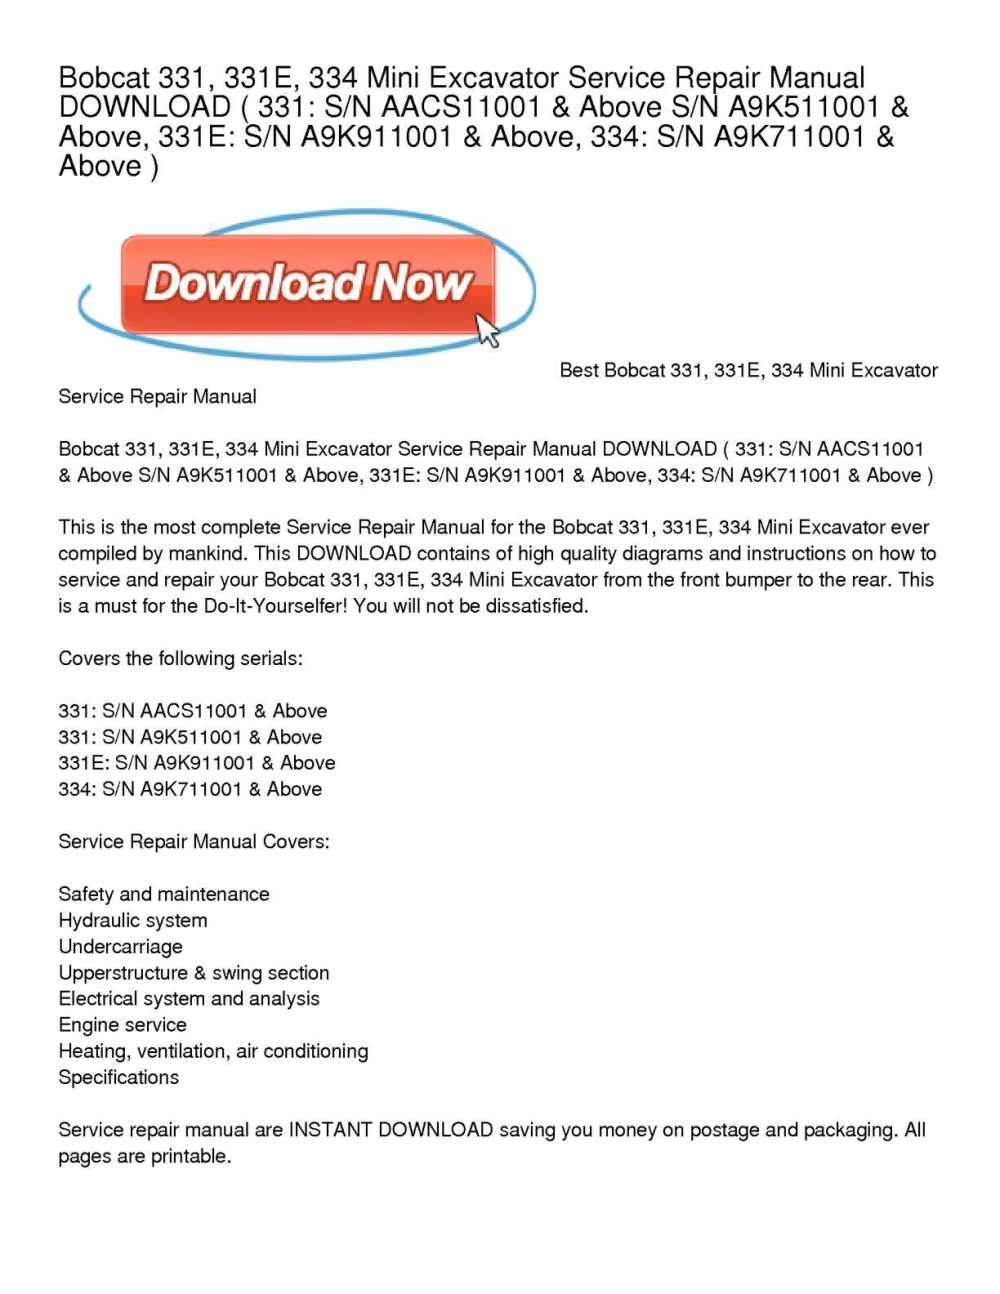 medium resolution of bobcat 331 331e 334 mini excavator service repair manual download